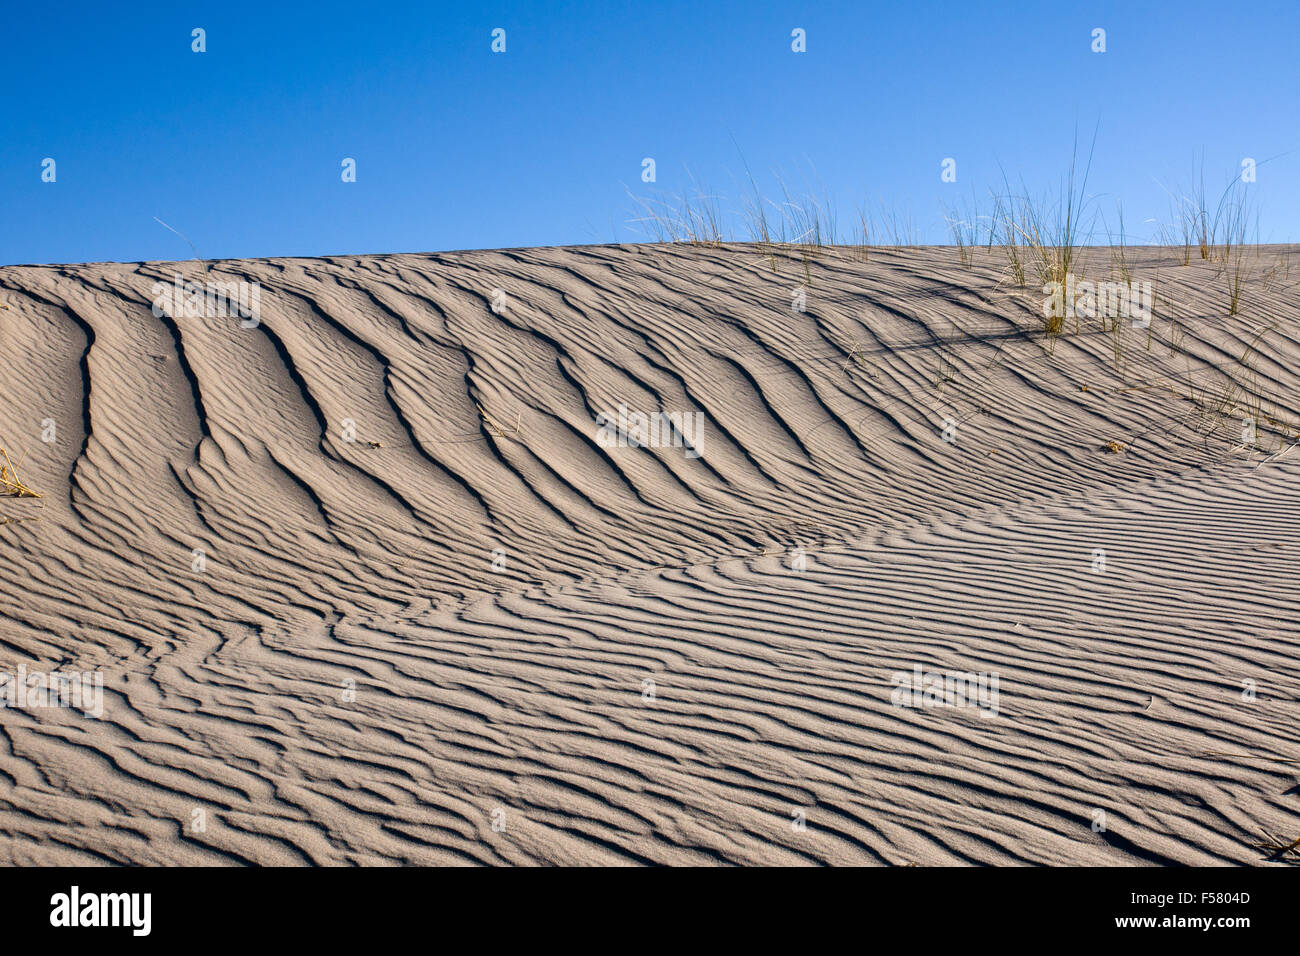 A sand dune with same marram grass and blue sky - Stock Image